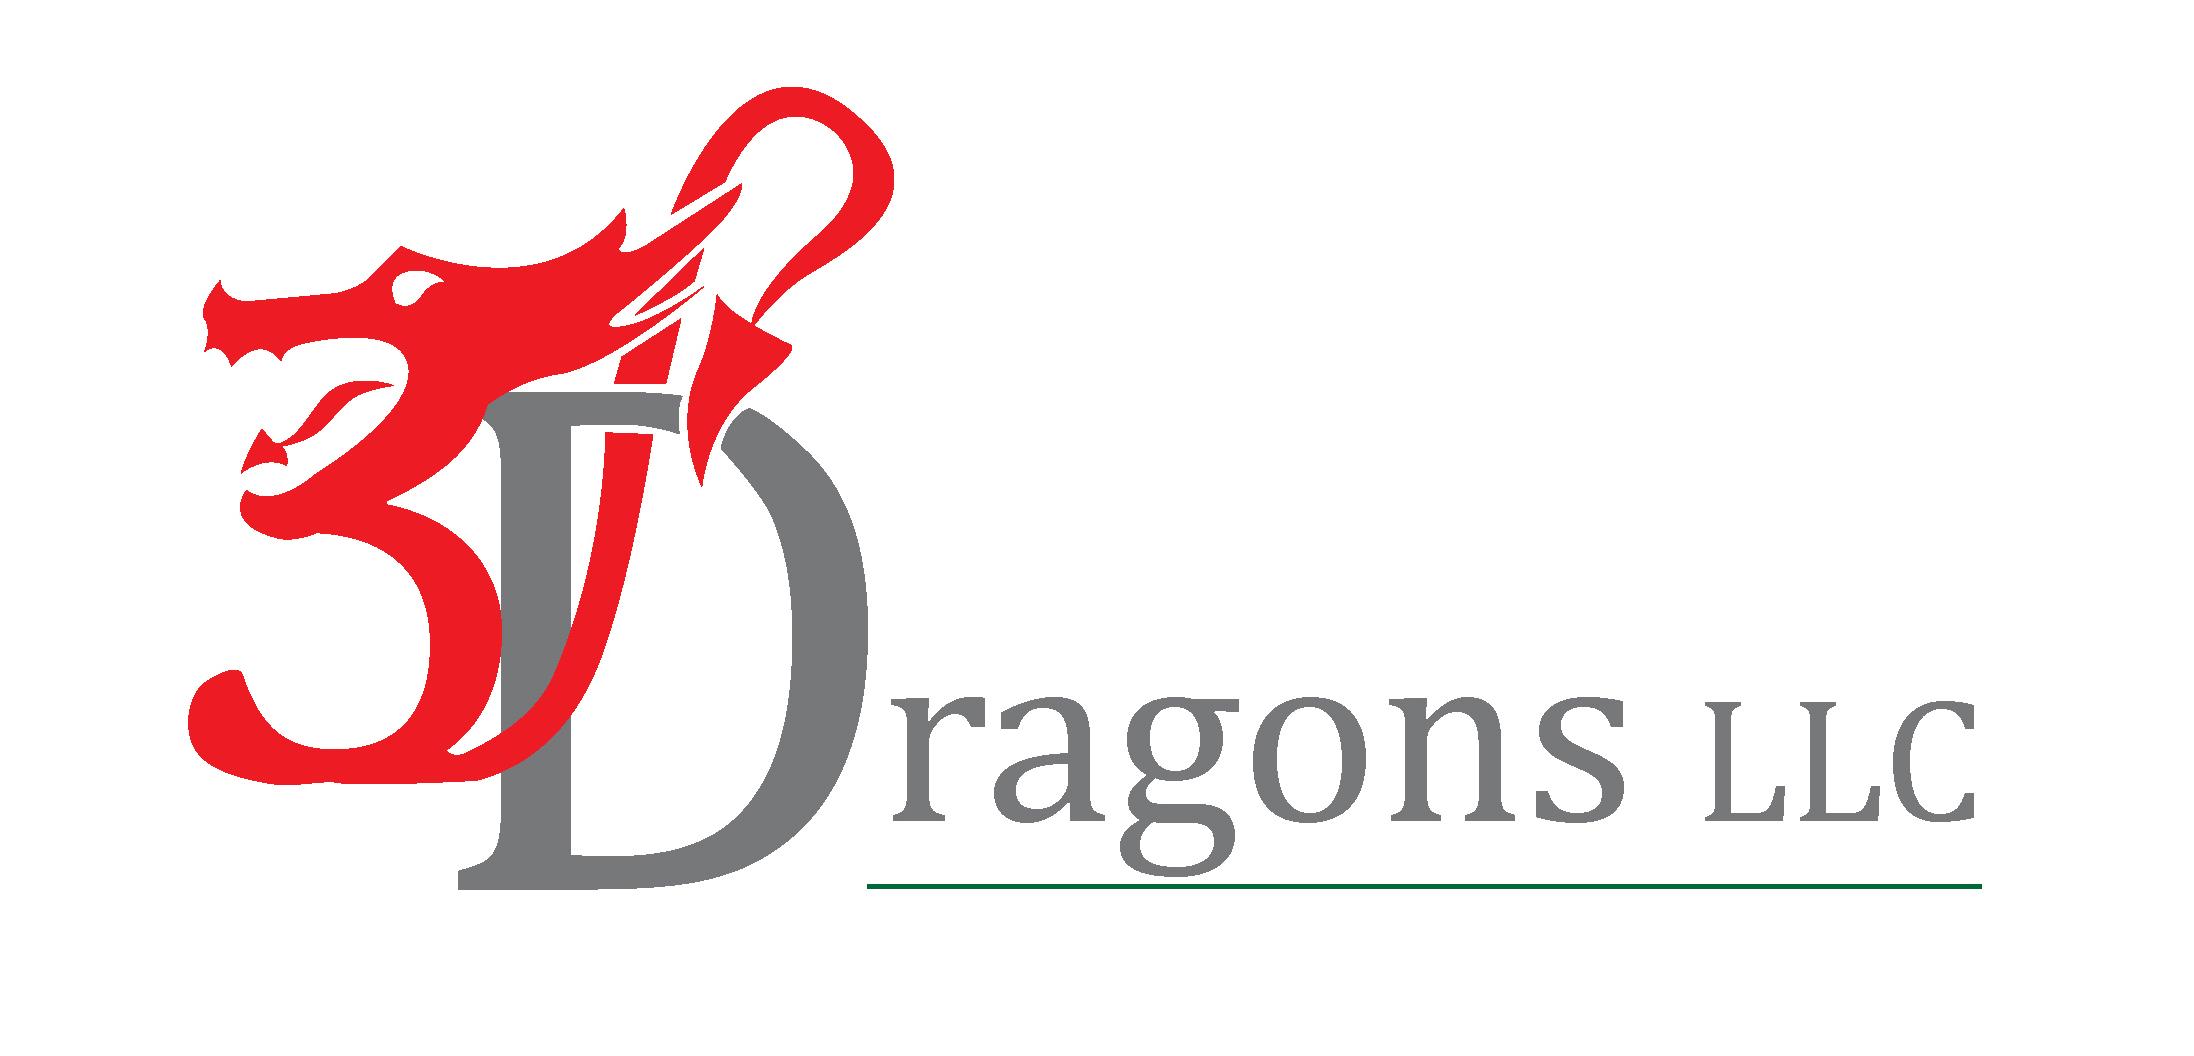 3dragons logo.jpg